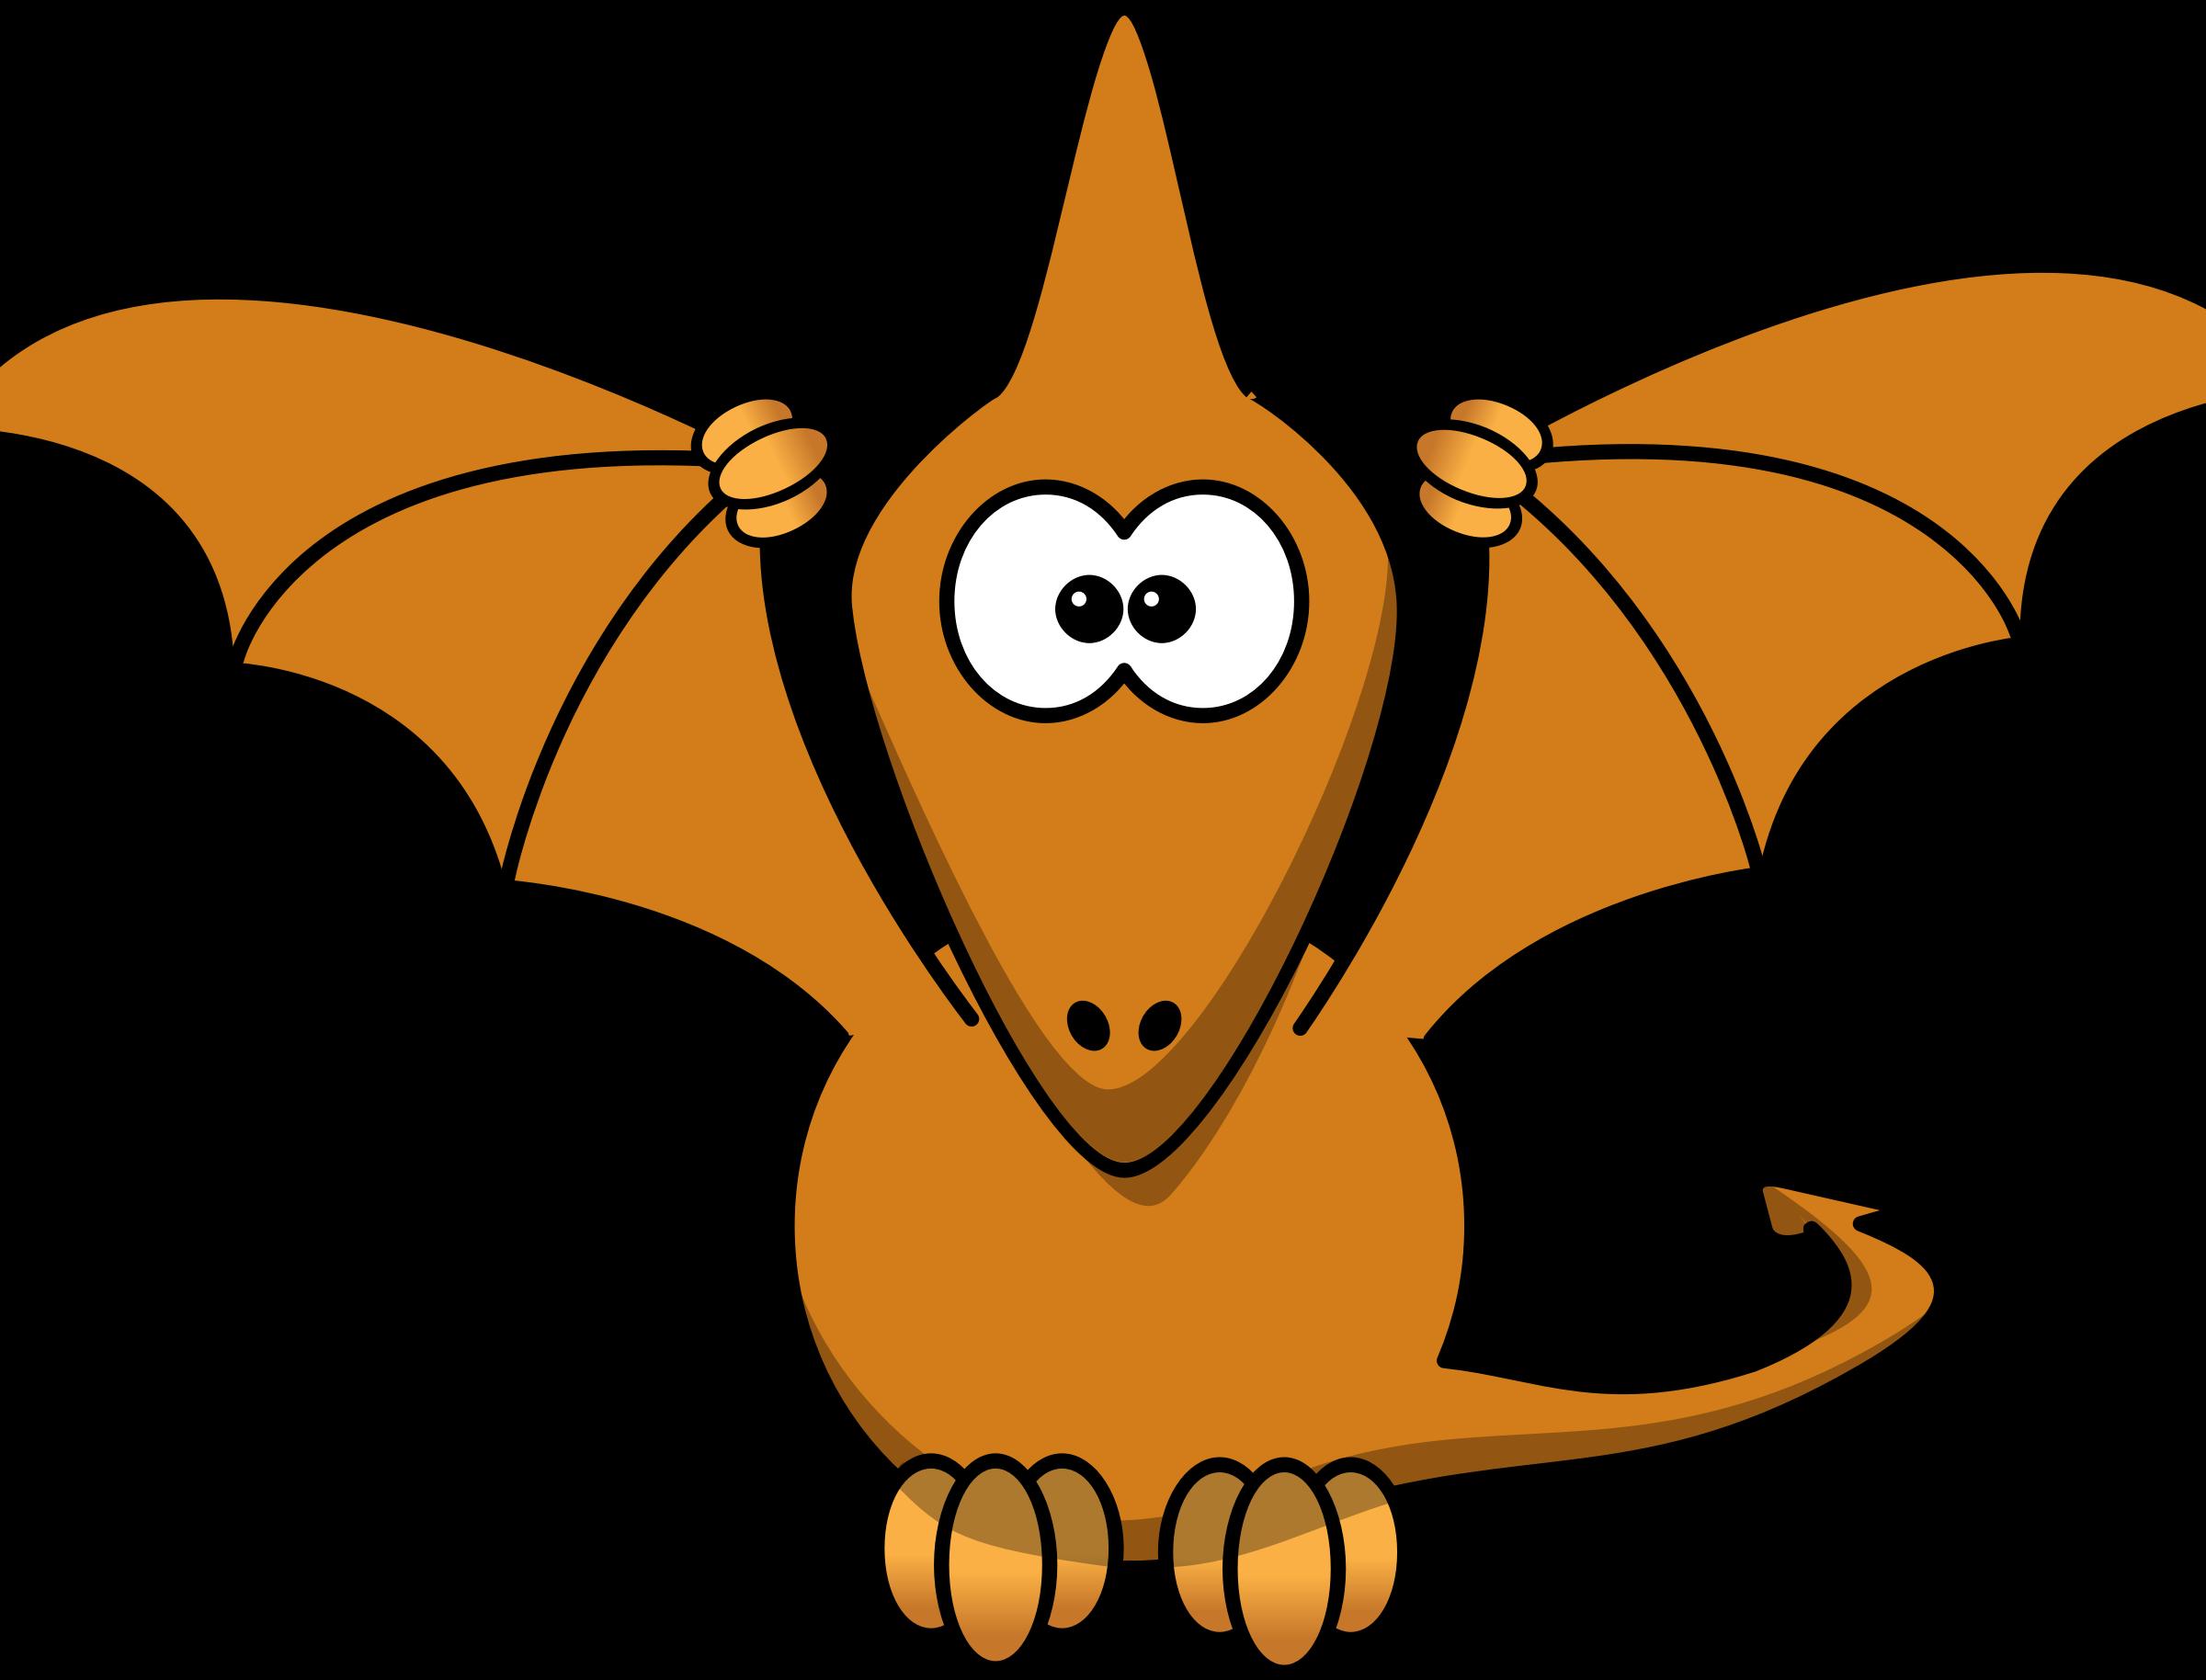 Cartoon pterodactyl with upraised. Dinosaur clipart scene